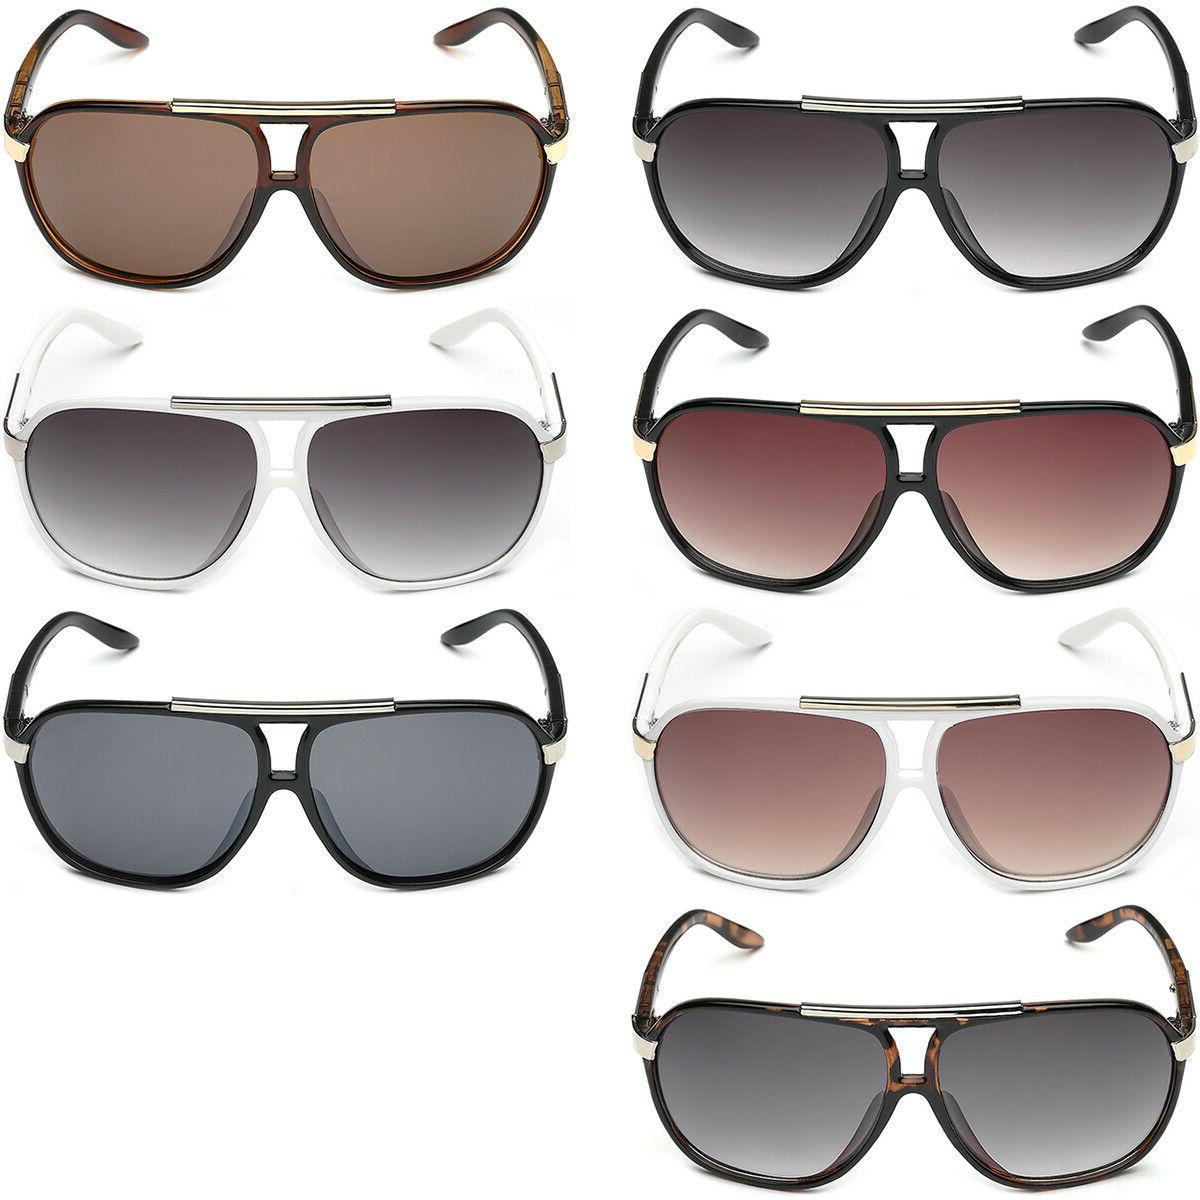 Retro 80s Fashion Sunglasses Black Men Women Vintage